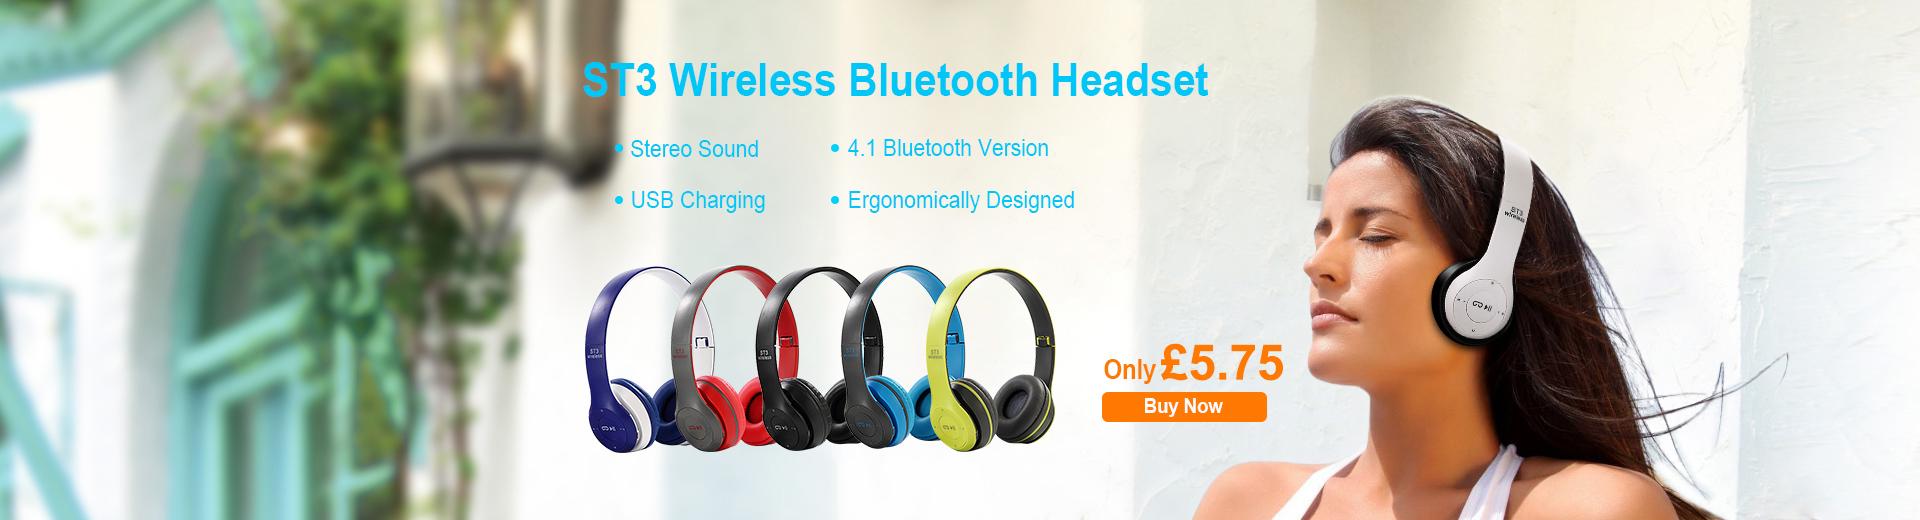 ST3 Wireless Bluetooth Headset